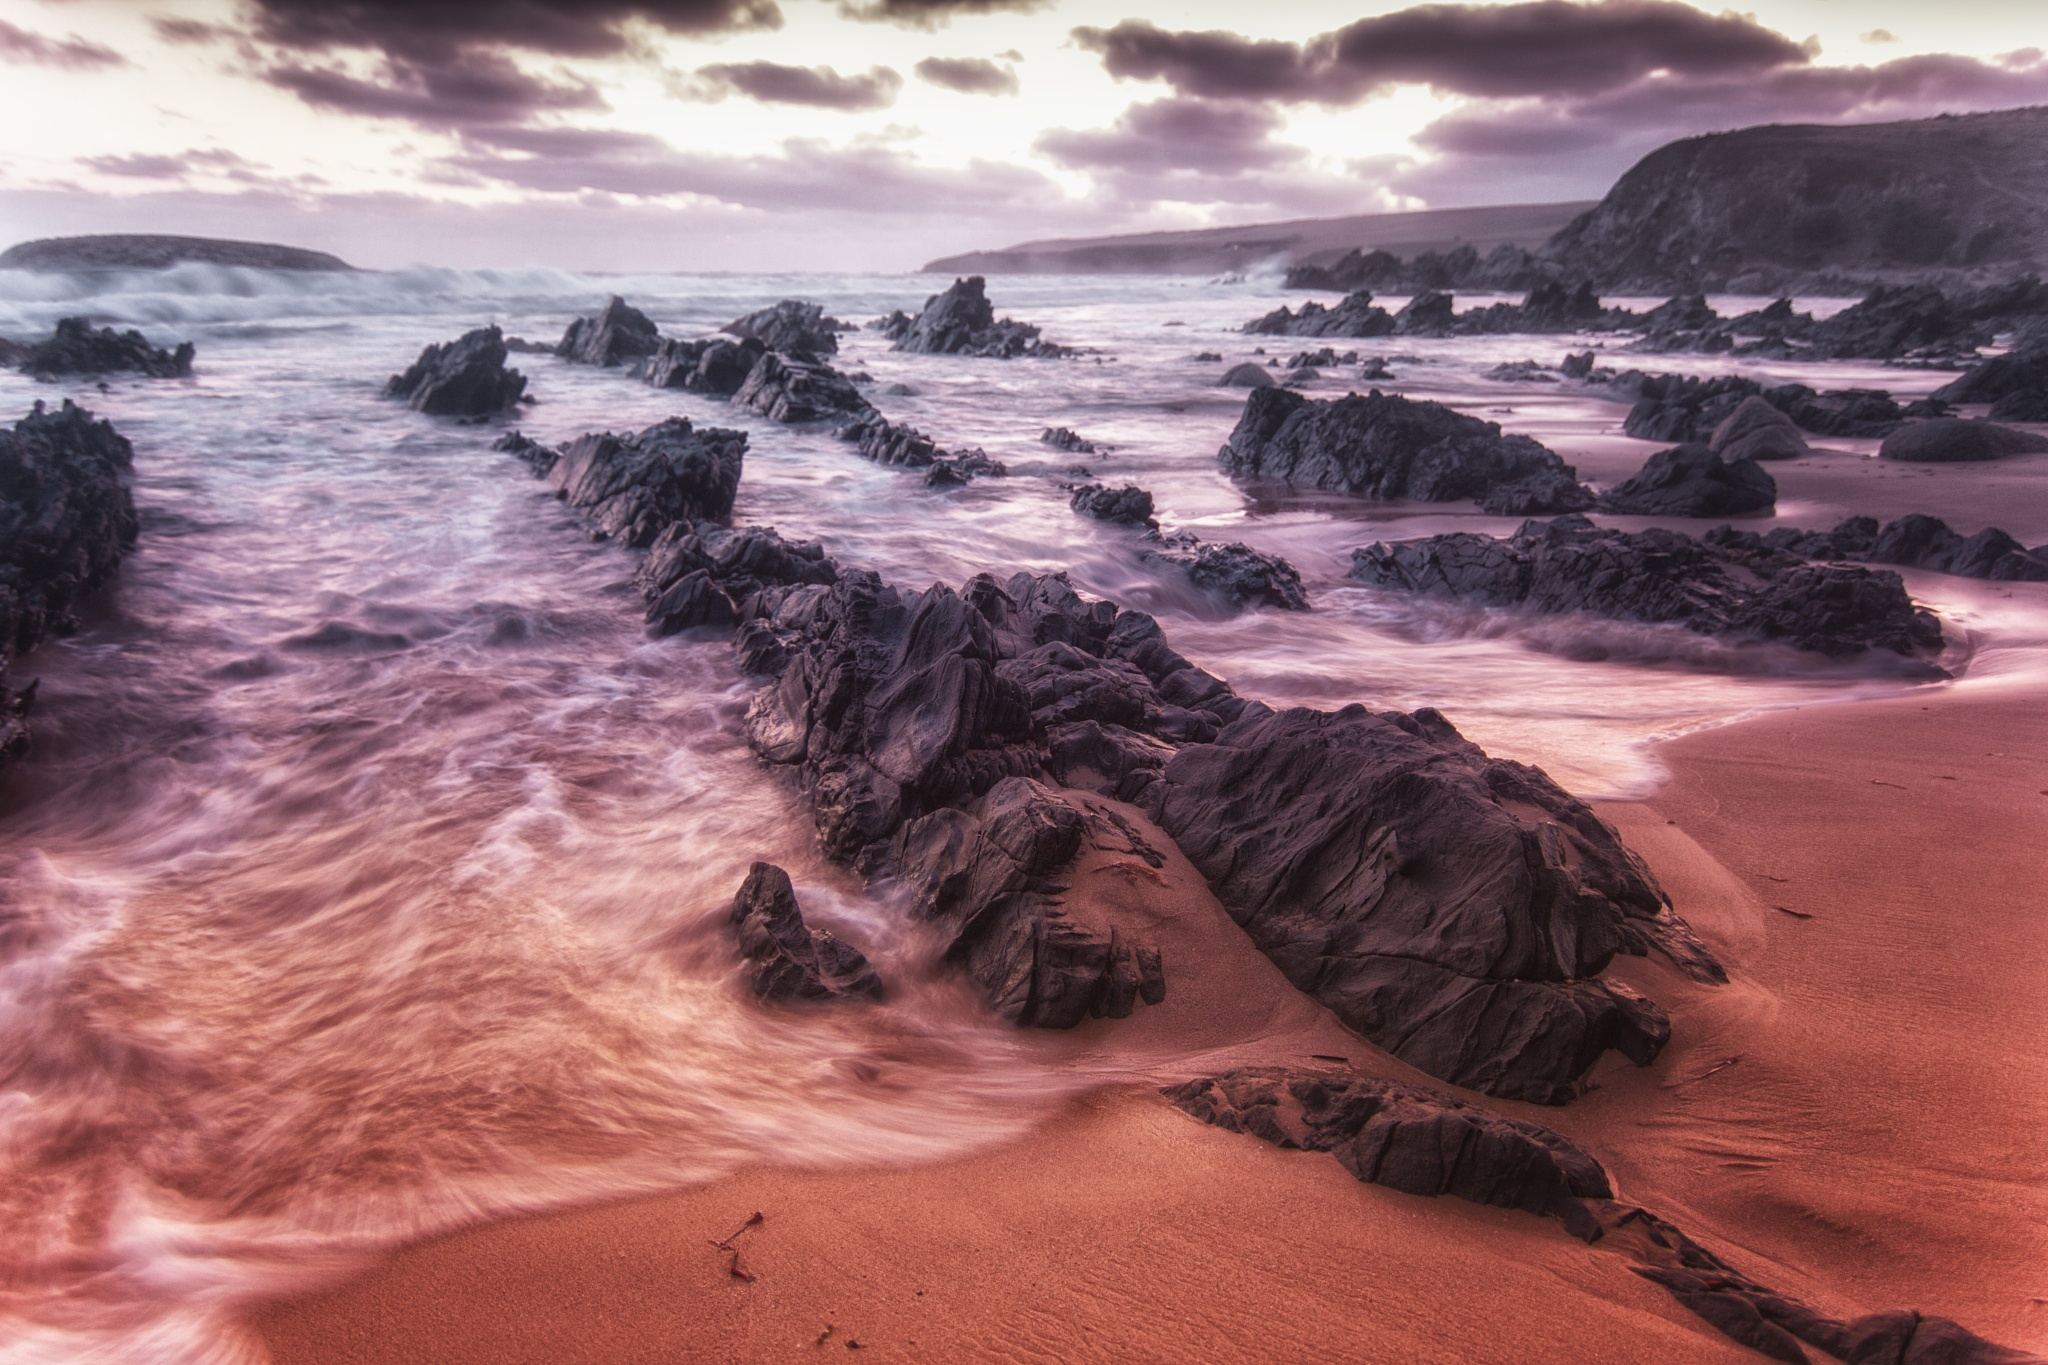 Deadly Cove by Nicole Rix